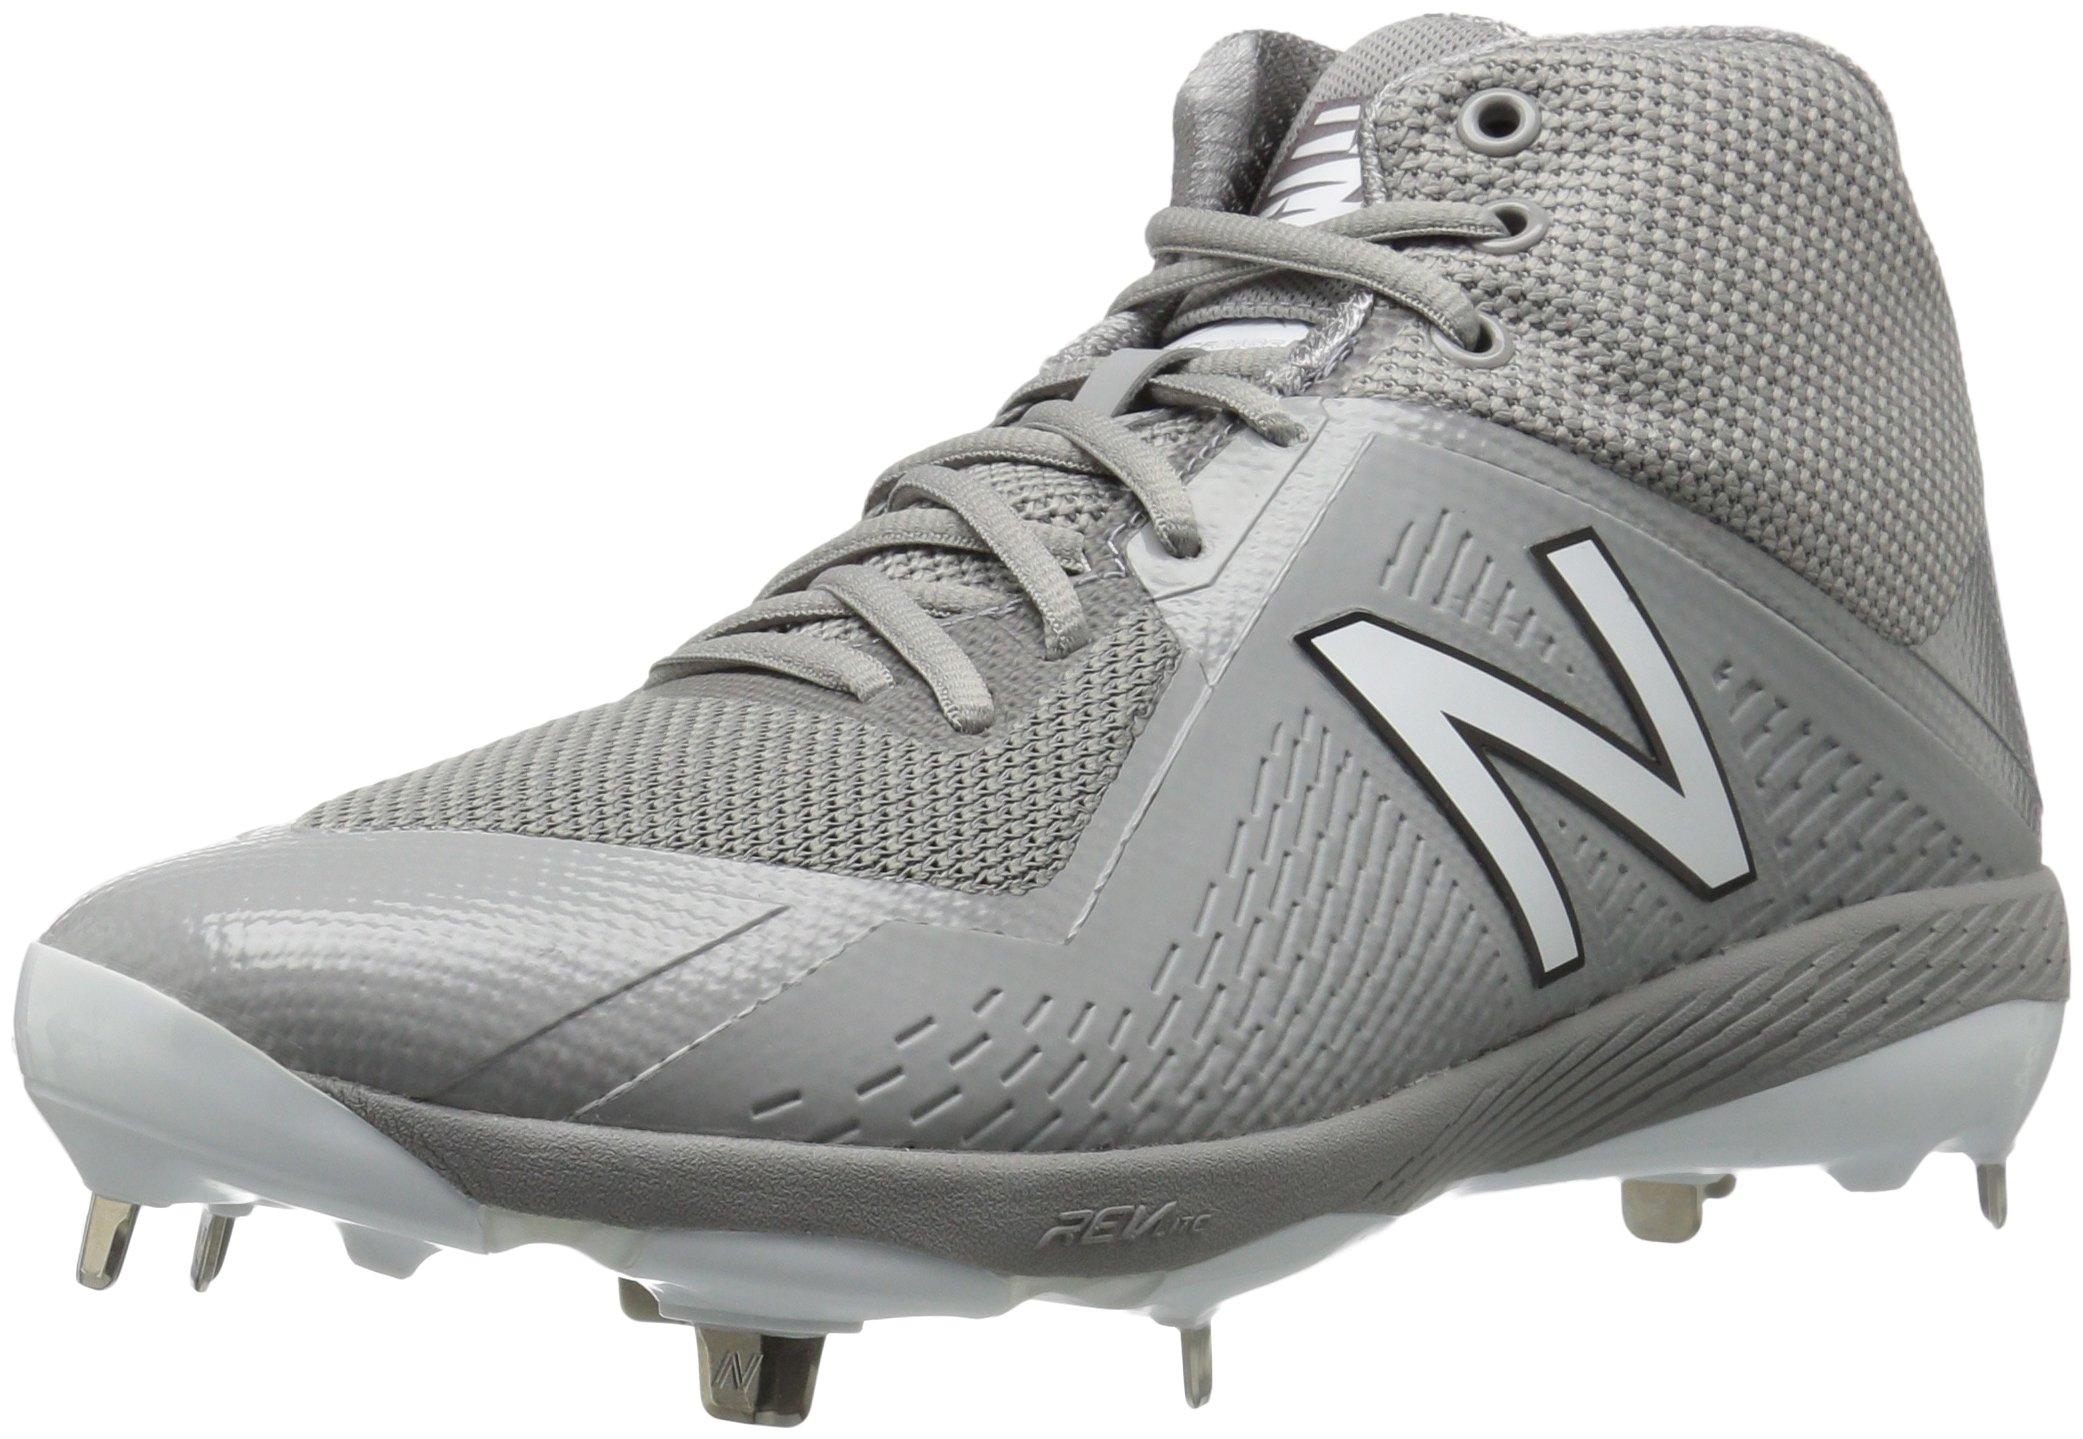 New Balance Men's M4040v4 Metal Baseball Shoe, Grey, 10 D US by New Balance